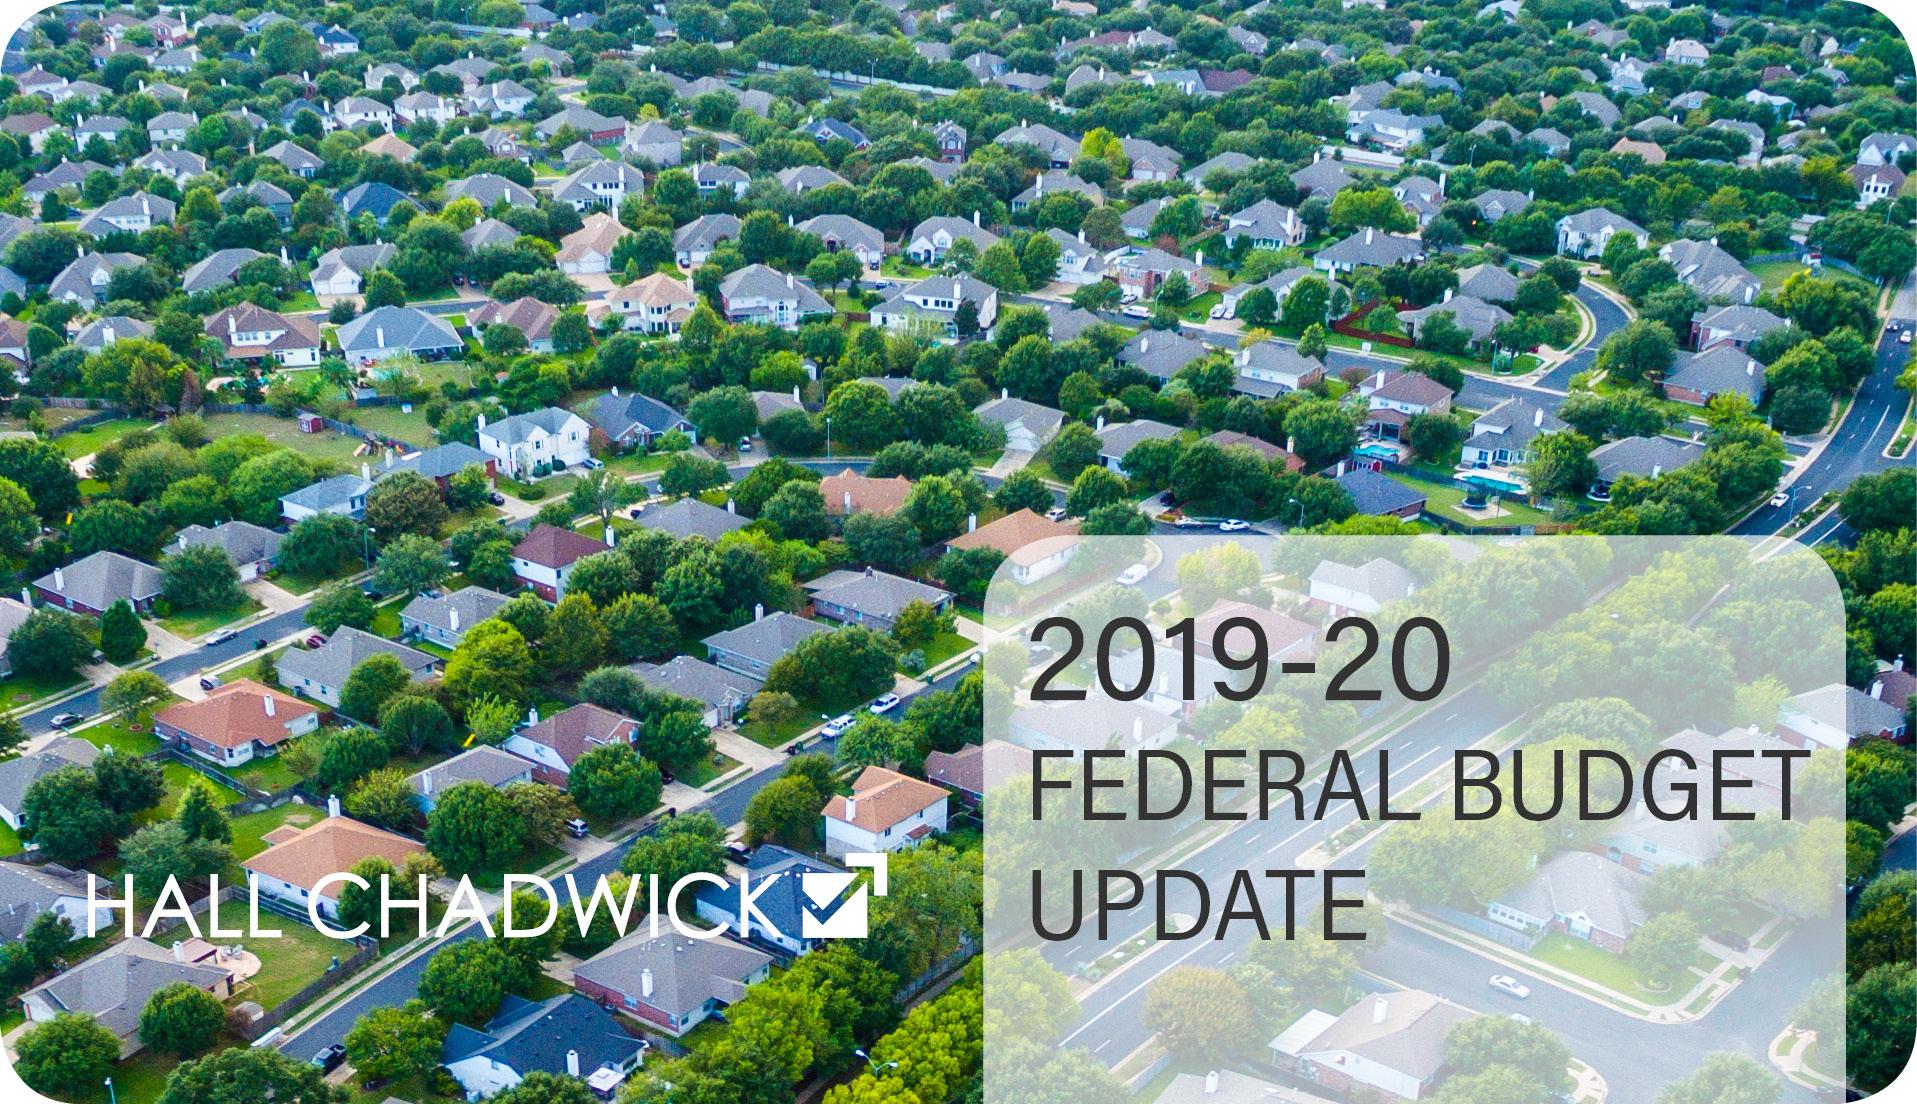 Budget Update 2019-20